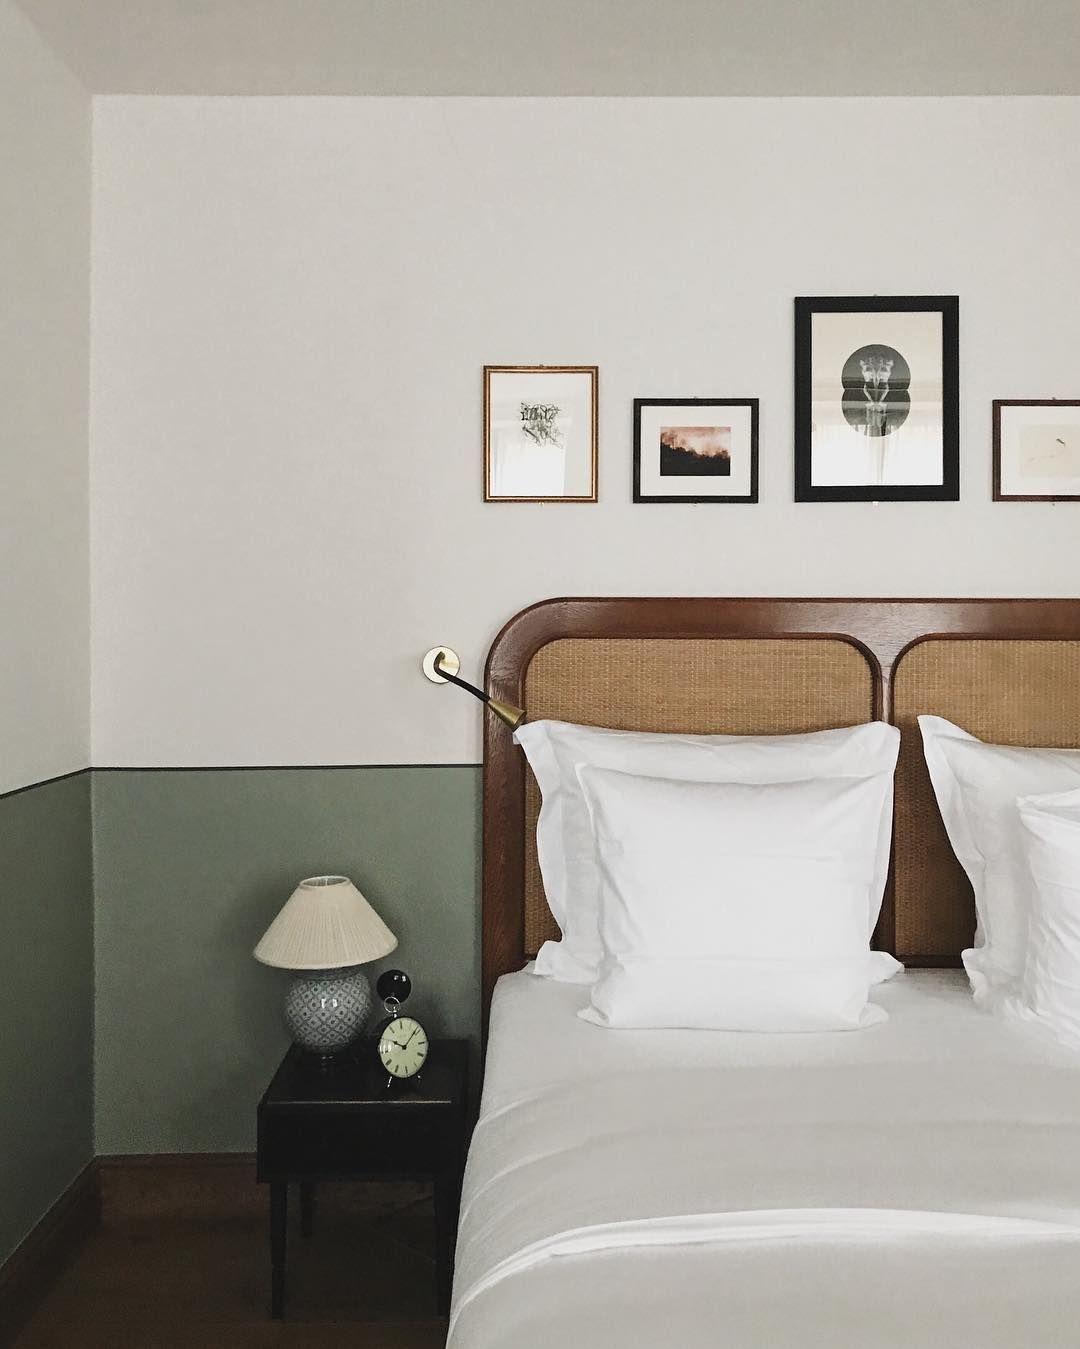 Une semaine sur Pinterest #19 (With images)  Home decor bedroom